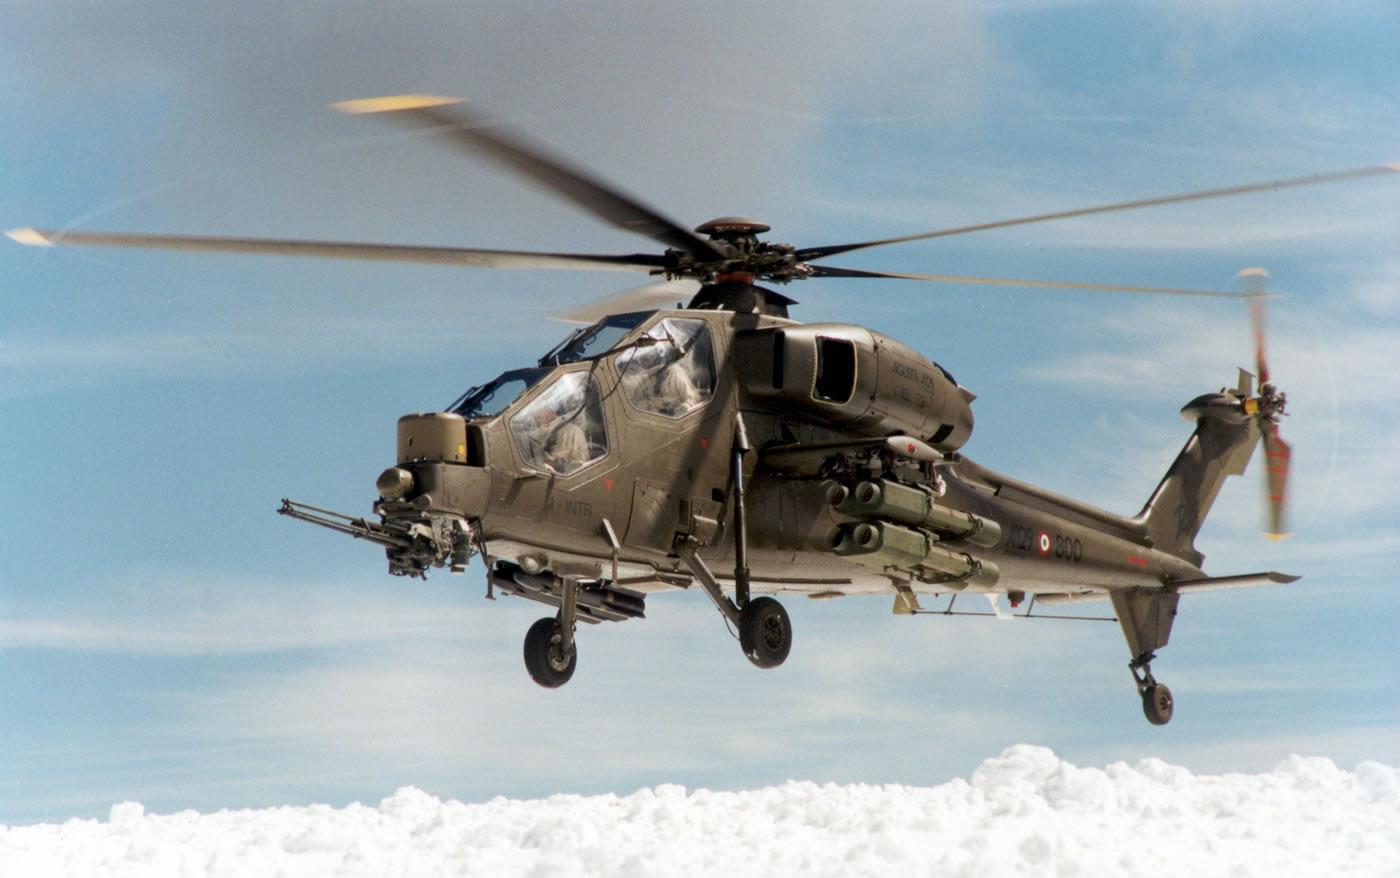 Agusta Westland AW 129 estaria na pauta da Força Terrestre. (Imagem: Agusta Westland)